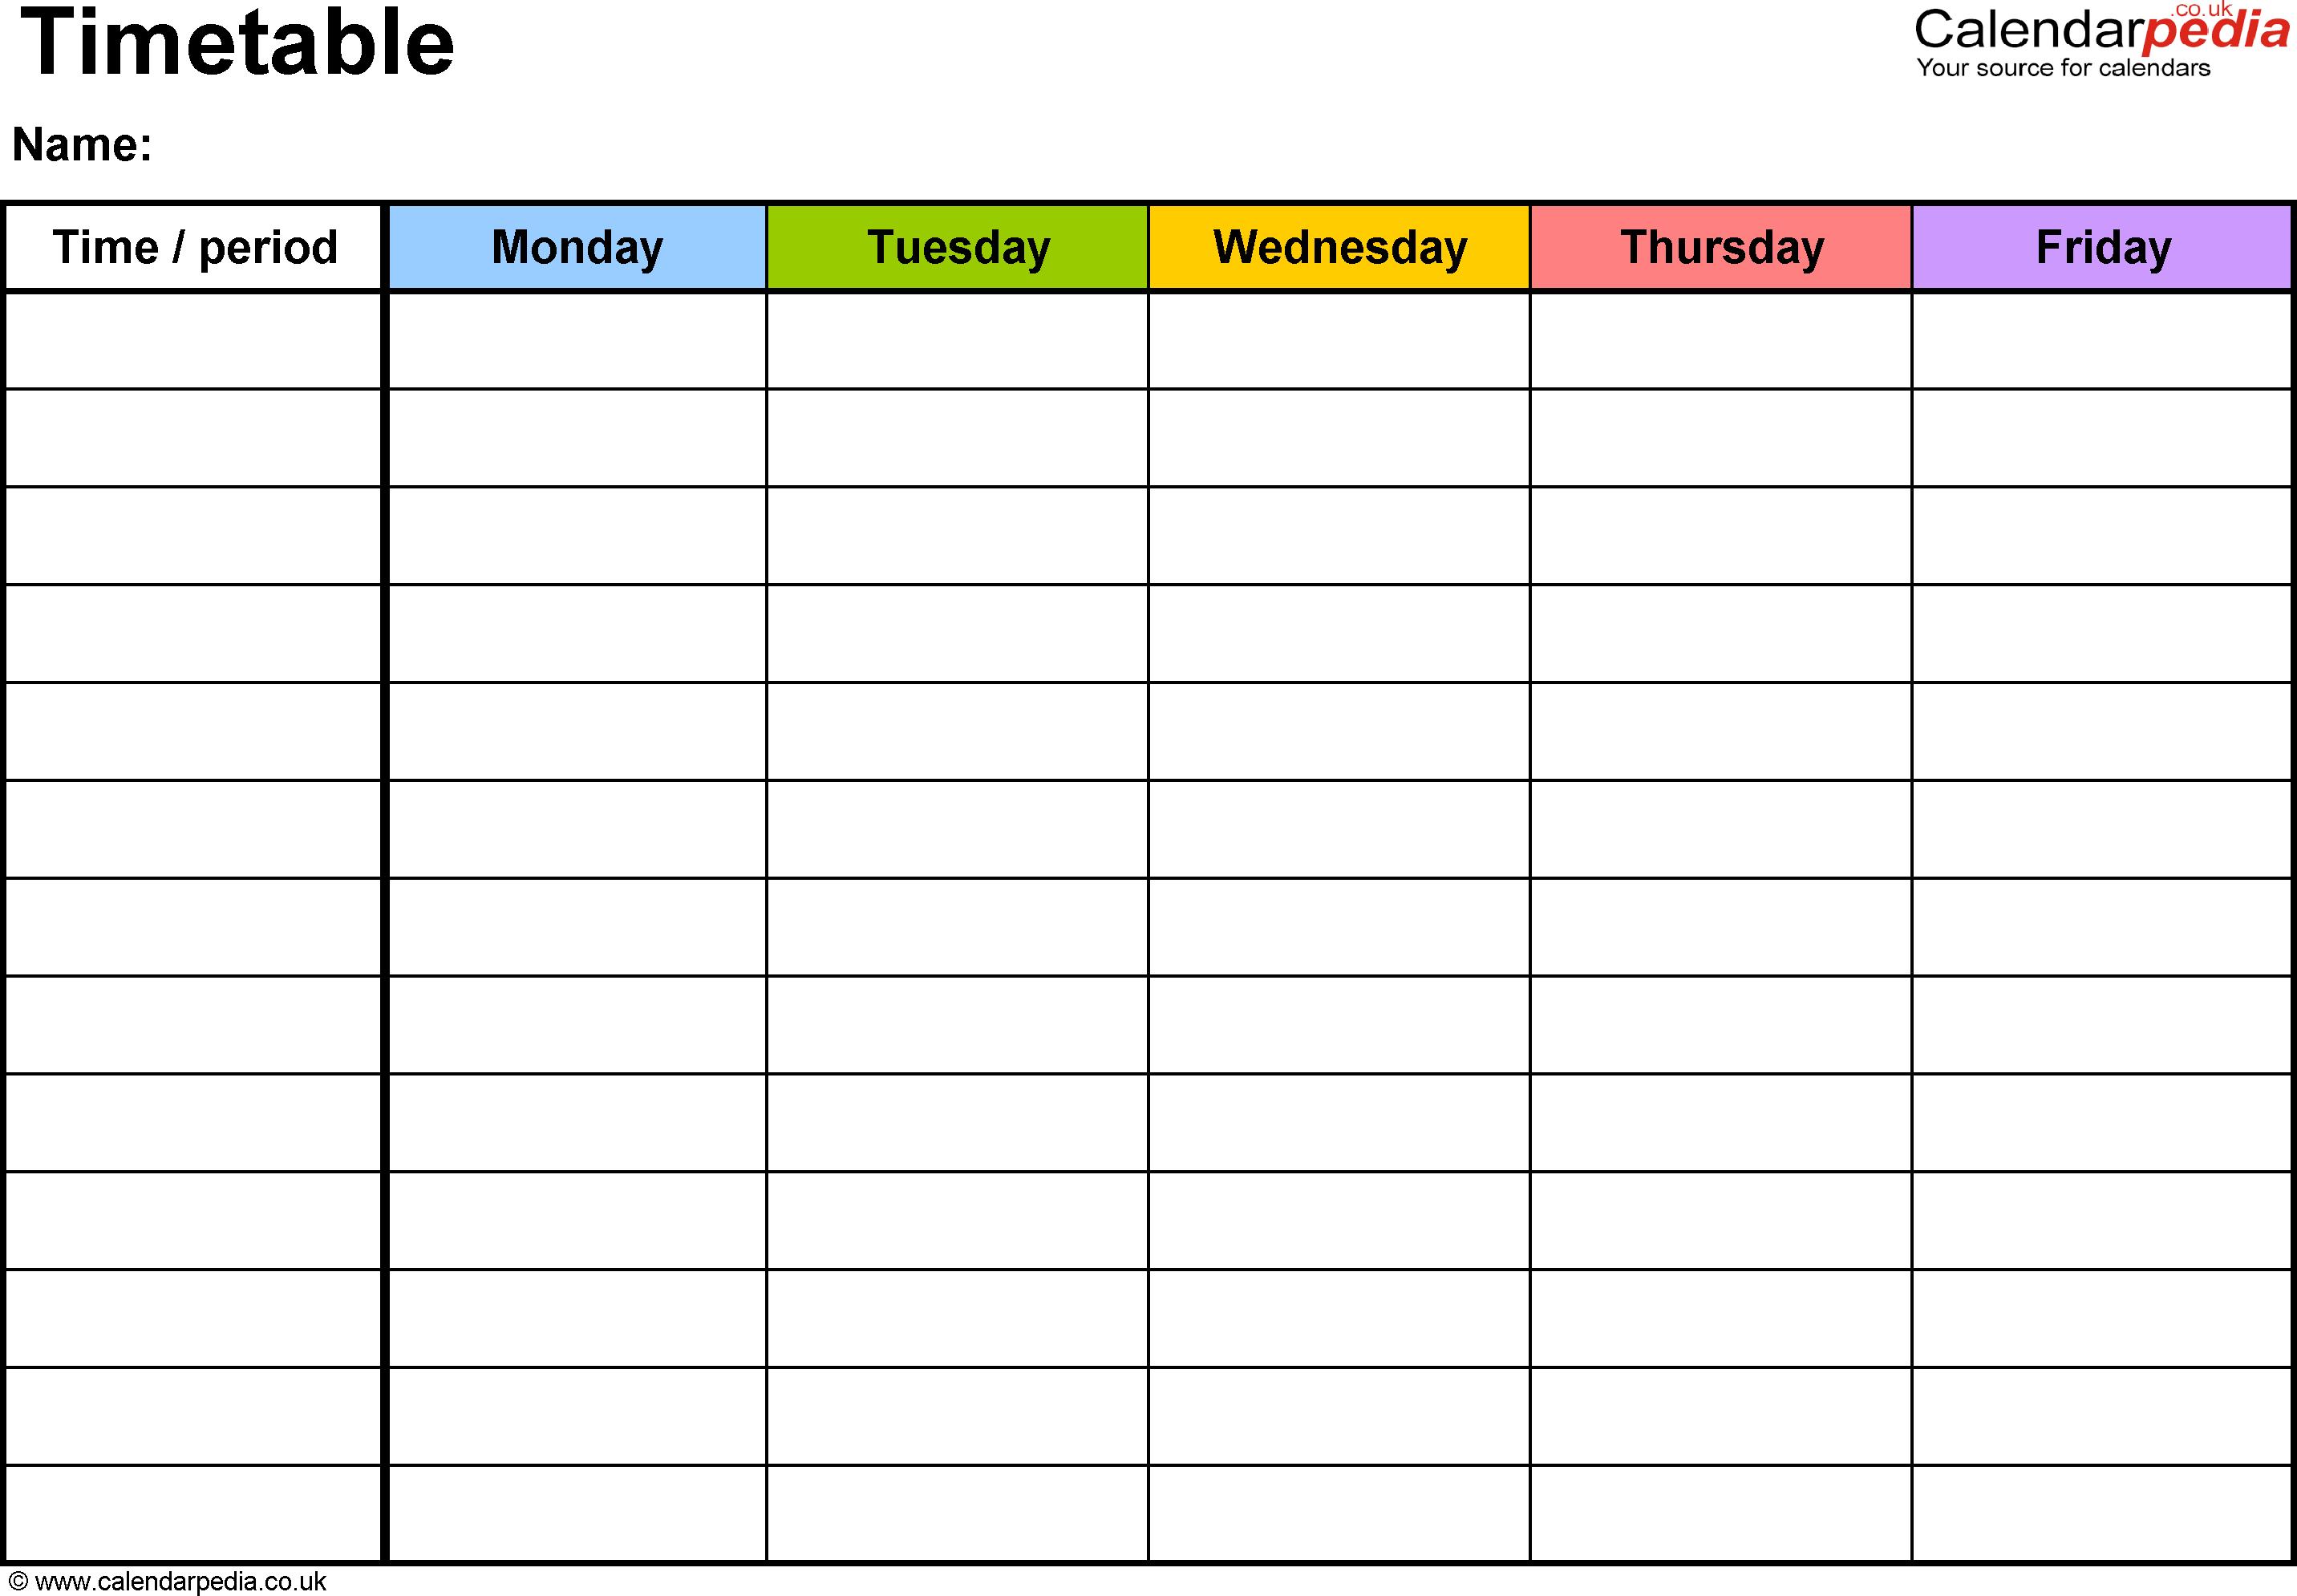 Timetable Template 2 Landscape Format A4 1 Page